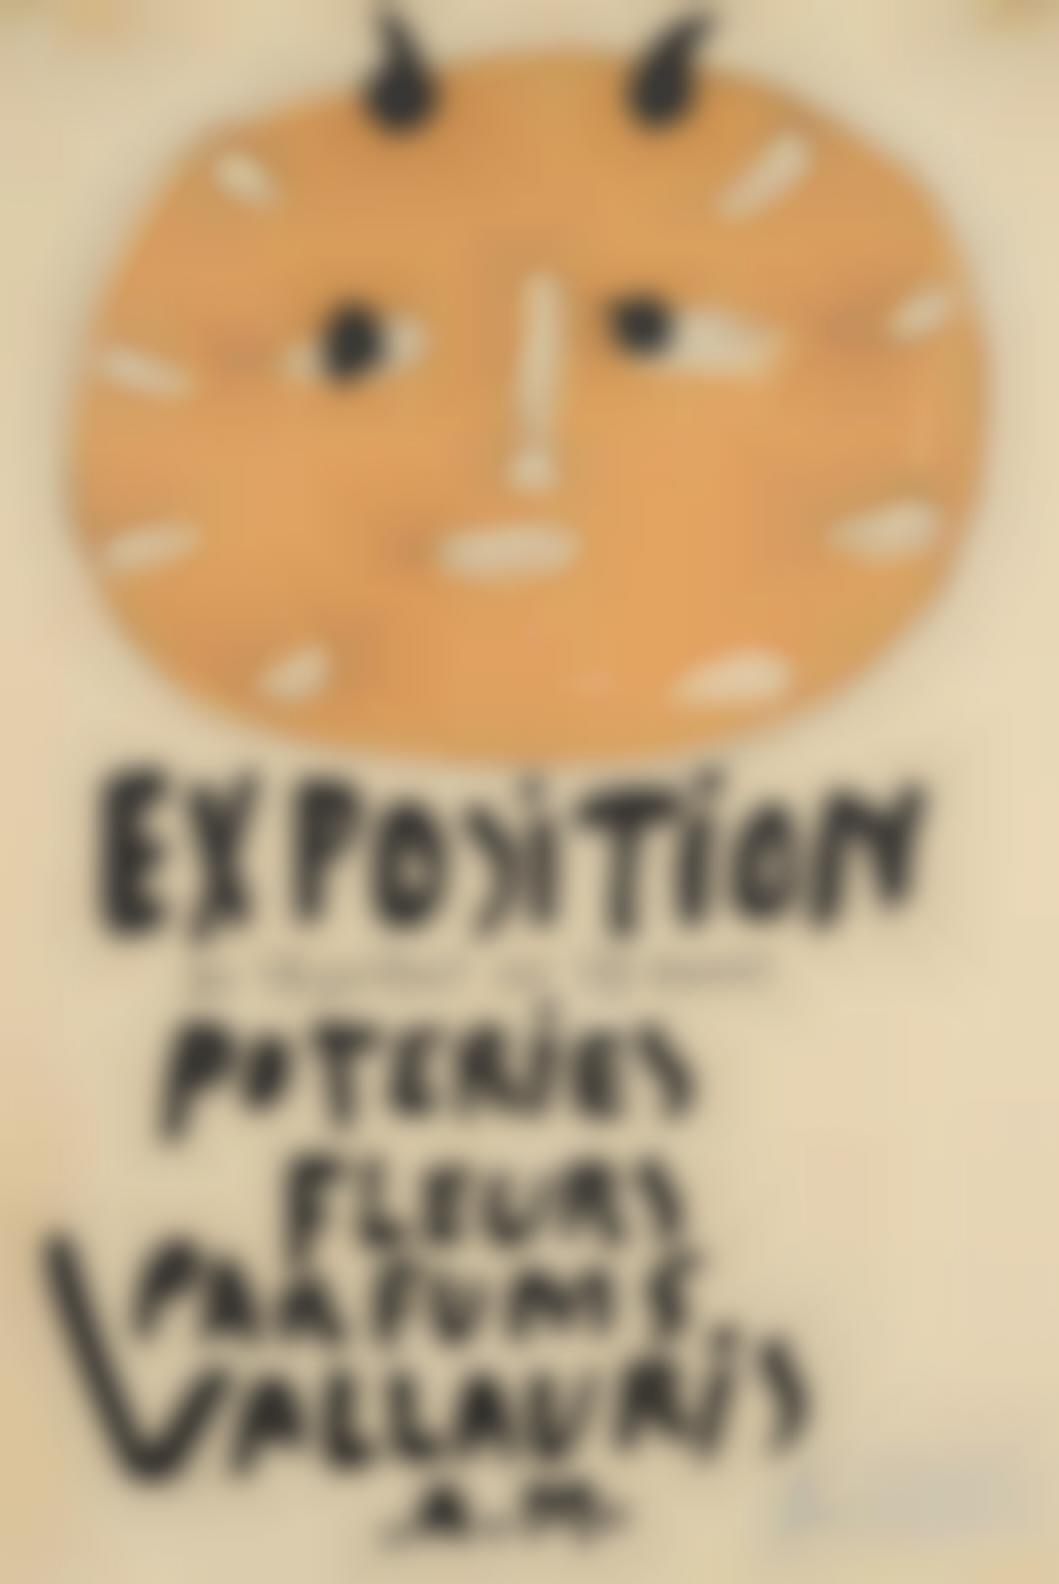 Pablo Picasso-Premiere Affiche Vallauris-1948